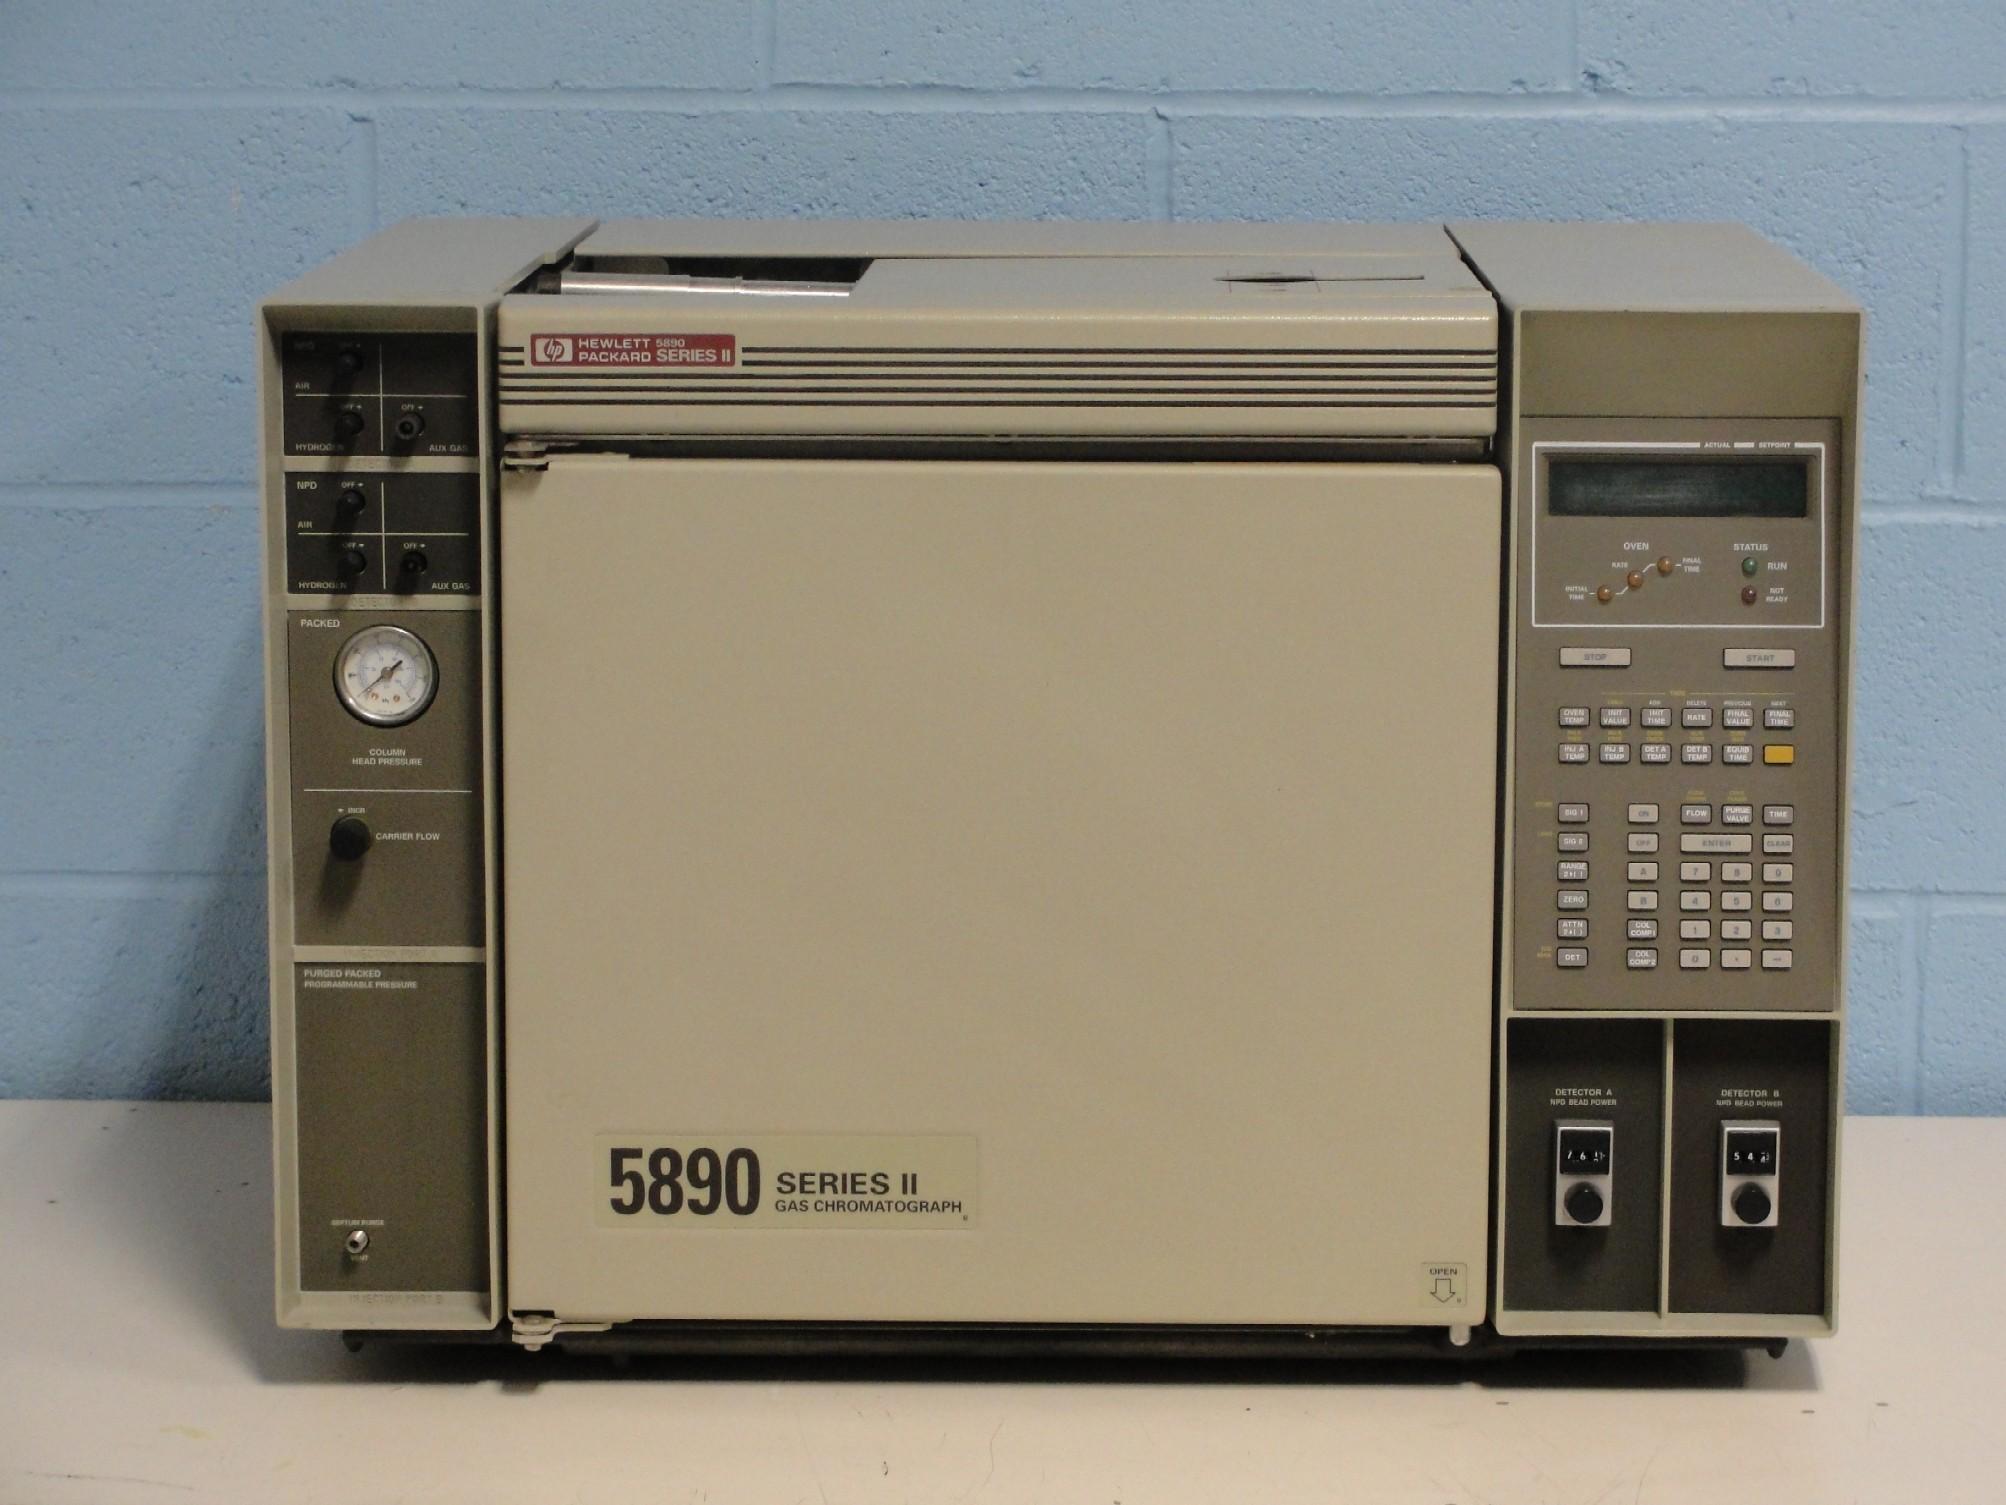 Hewlett Packard 5890 Series II Gas Chromatograph (GC) System Split/Splitless Programmable Pressure Injector Image